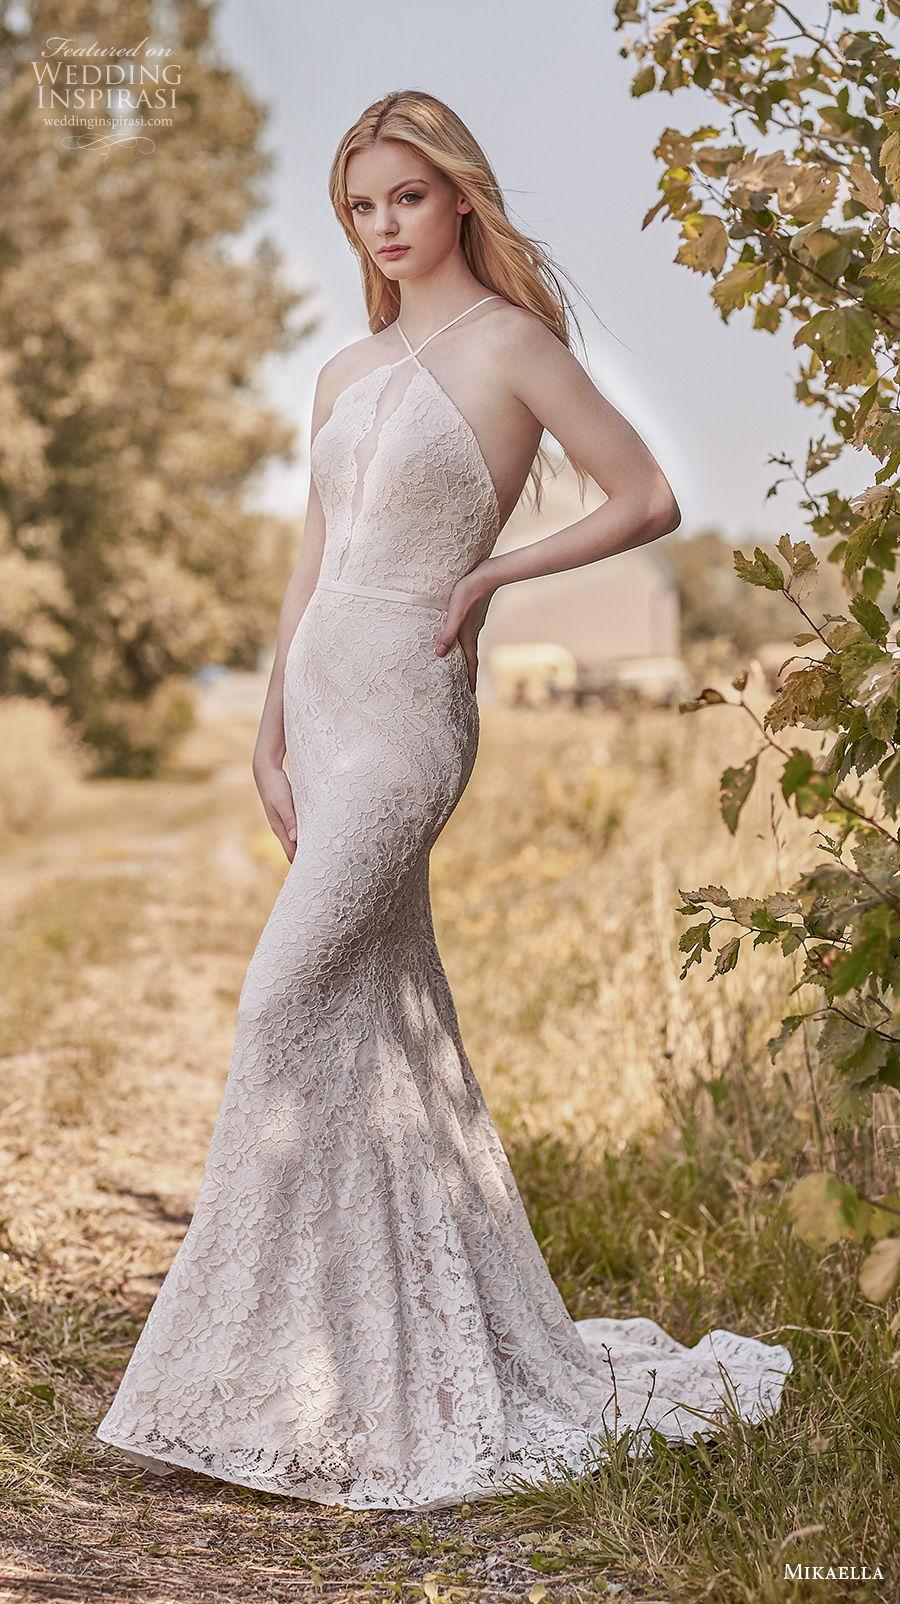 mikaella spring 2020 bridal sleeveless halter neck full embellishment elegant sexy sheath fit and flare wedding dress cross strap back chapel train (6) mv